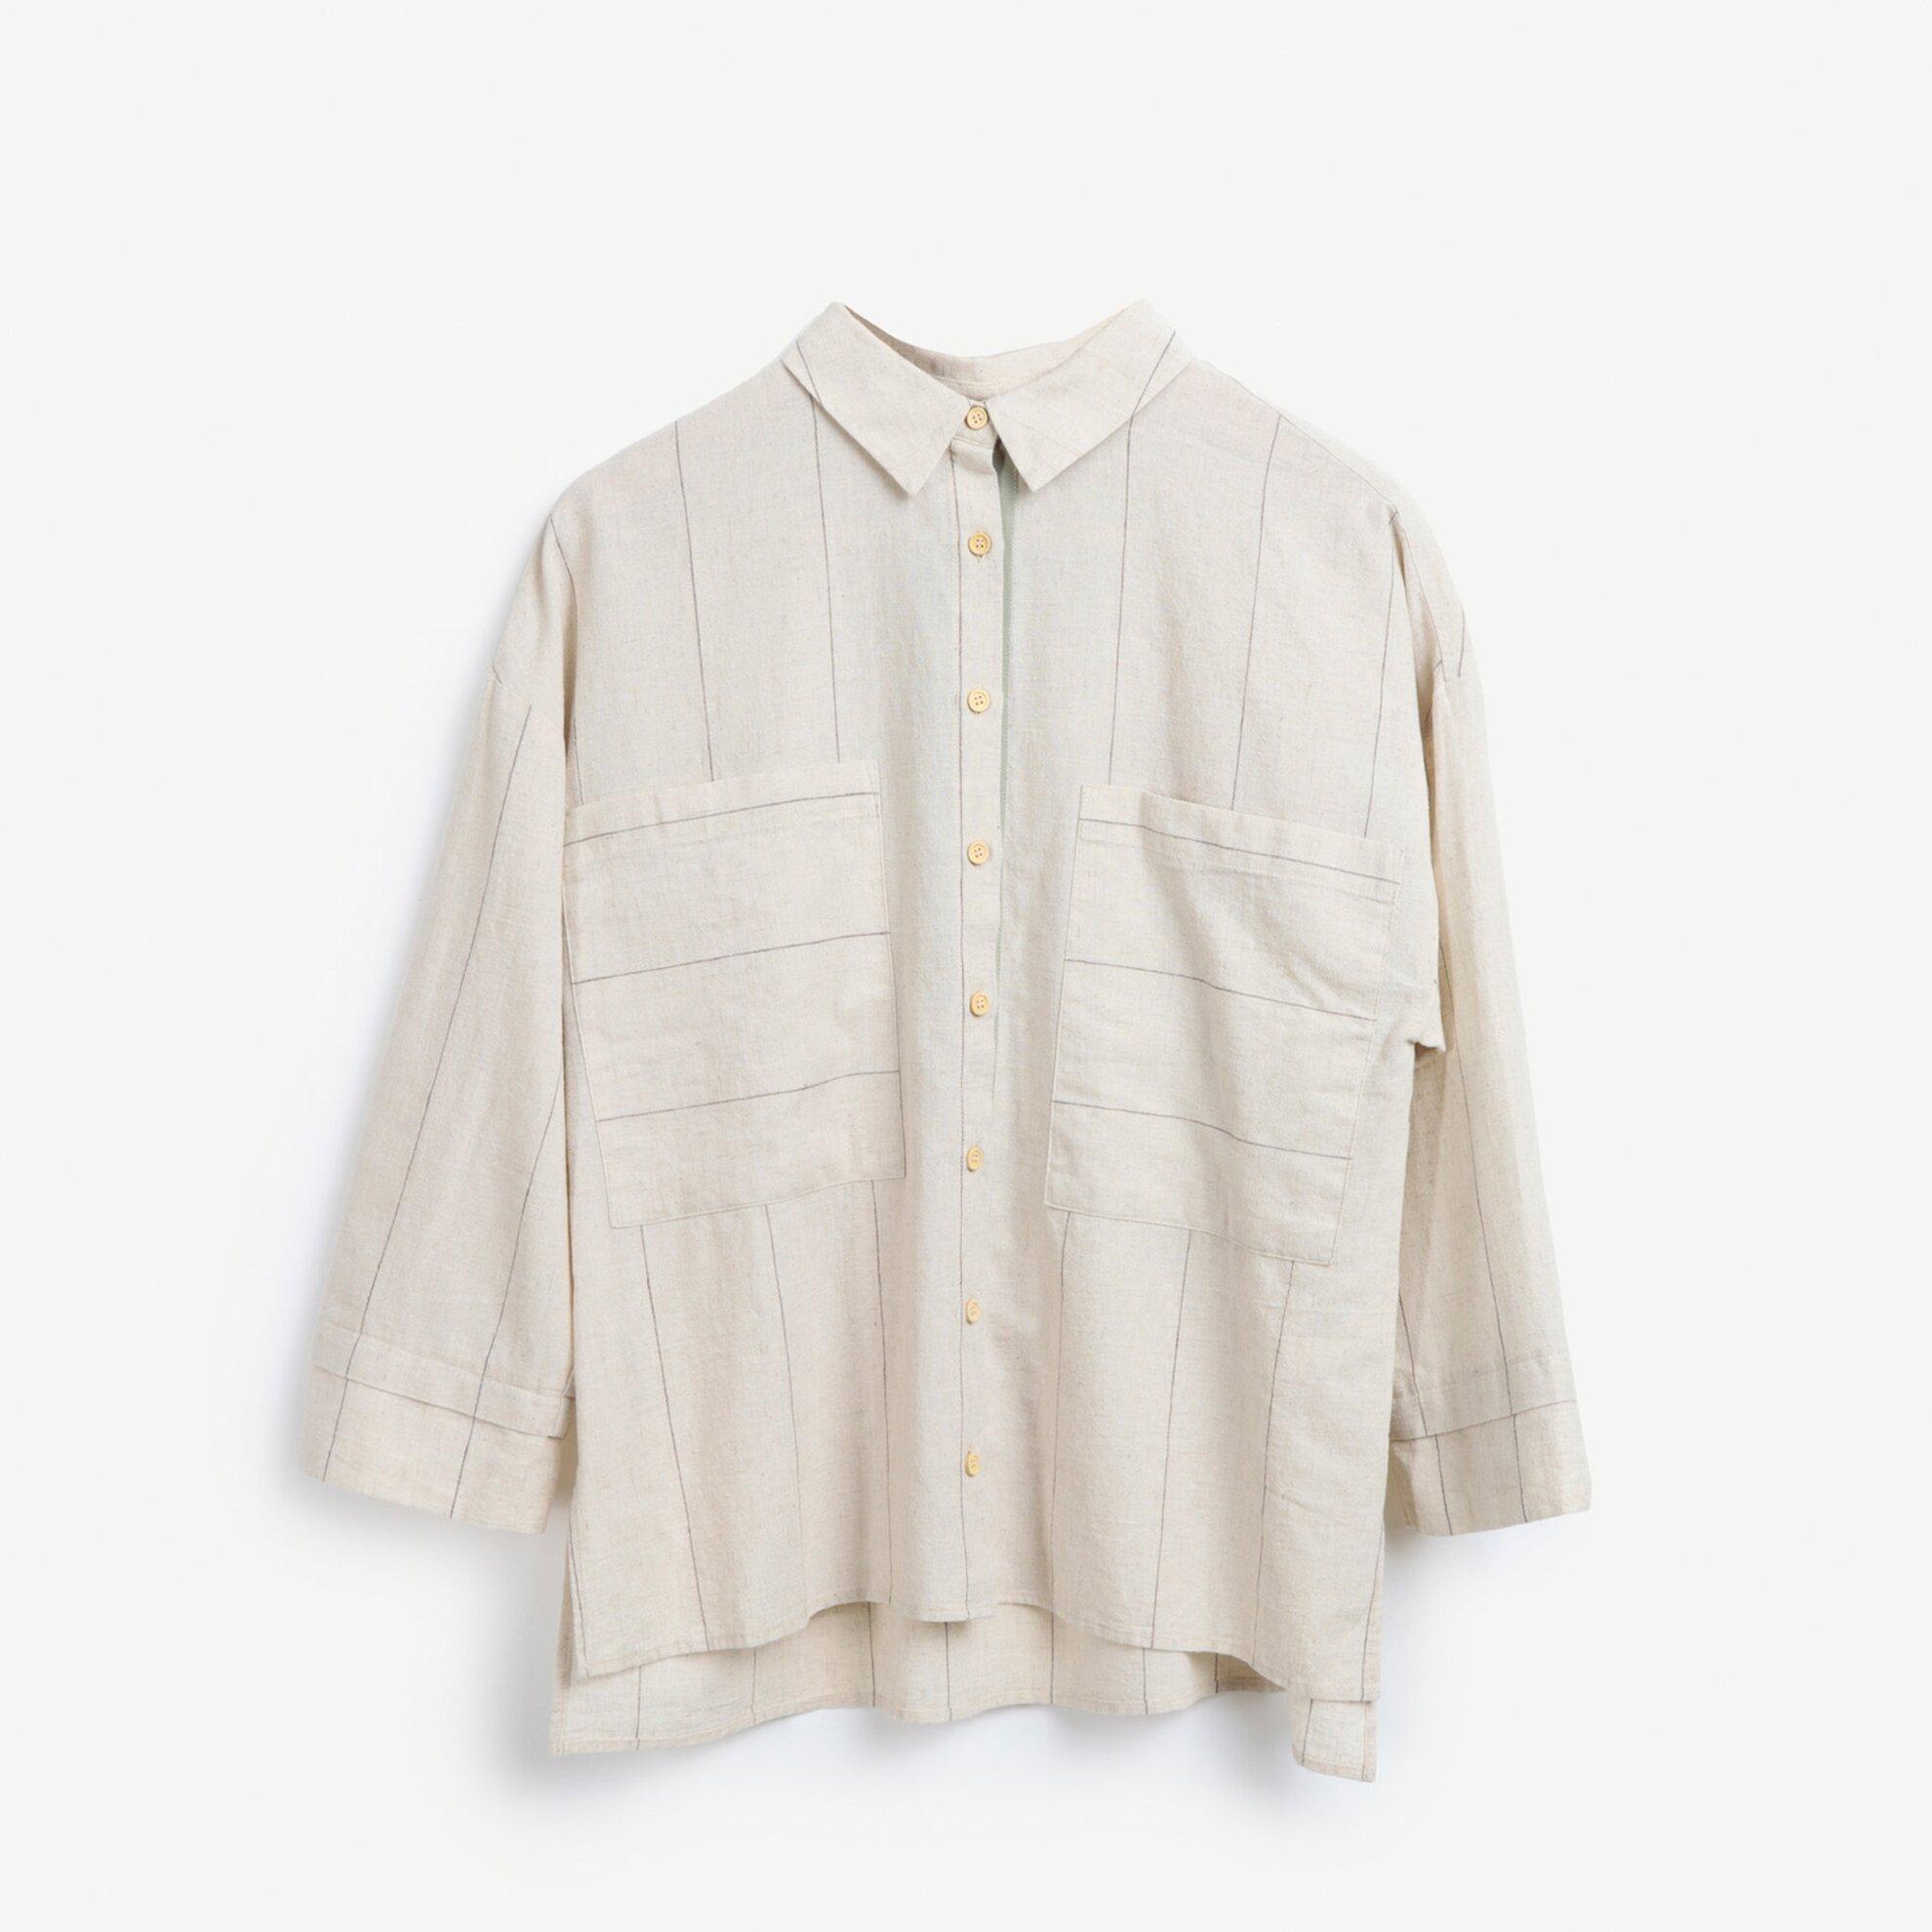 Cep Detaylı Rahat Kalıp Gömlek